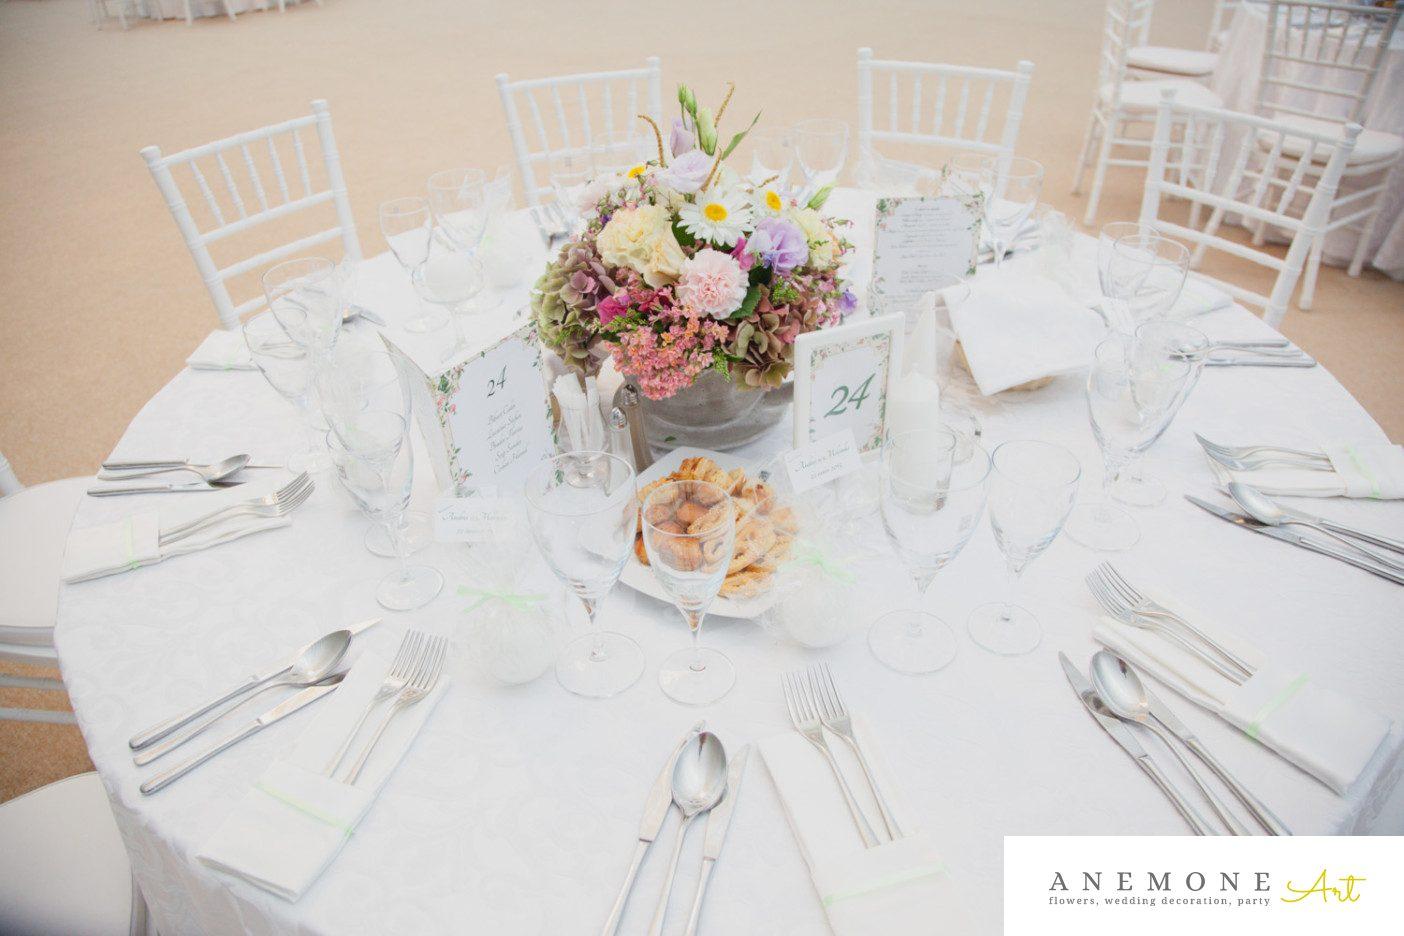 Poza, foto cu Flori de nunta decor masa, multicolor in Arad, Timisoara, Oradea (wedding flowers, bouquets) nunta Arad, Timisoara, Oradea